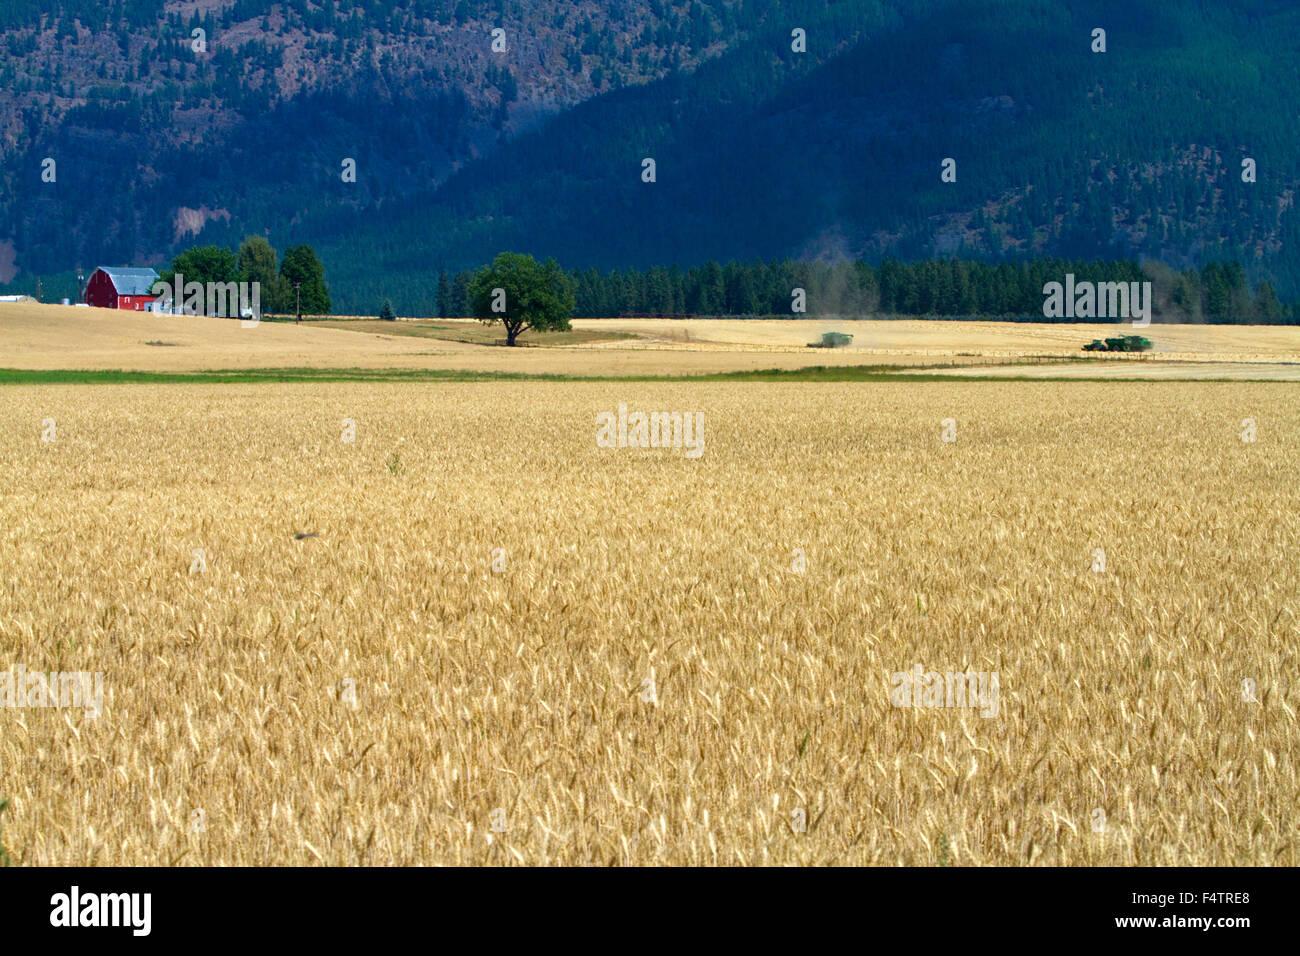 Ripe wheat field near Kalispell, Montana, USA. - Stock Image